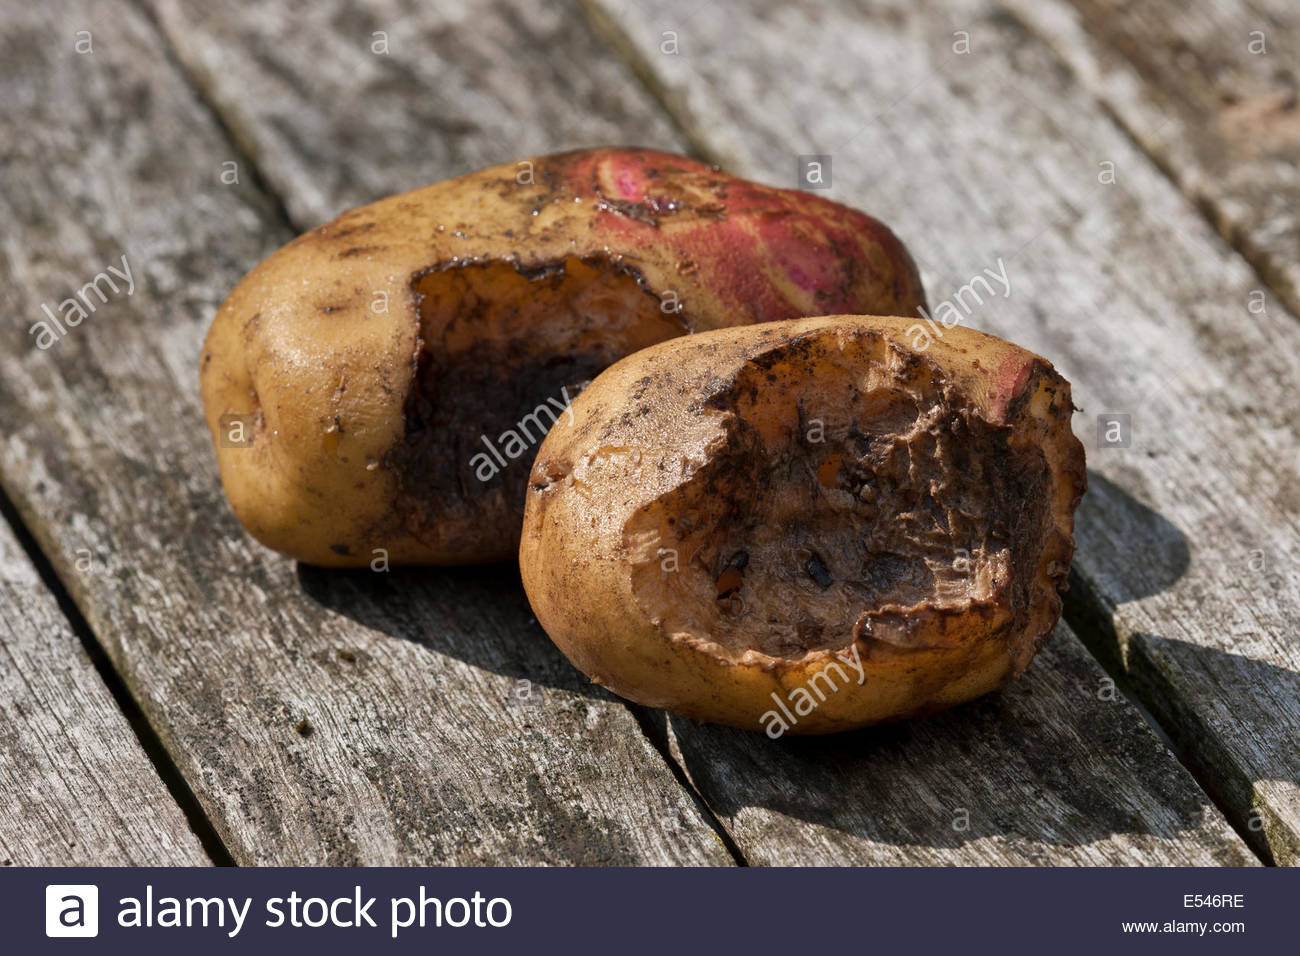 Rodent damage on potato tuber mouse mice rat eating digging ...